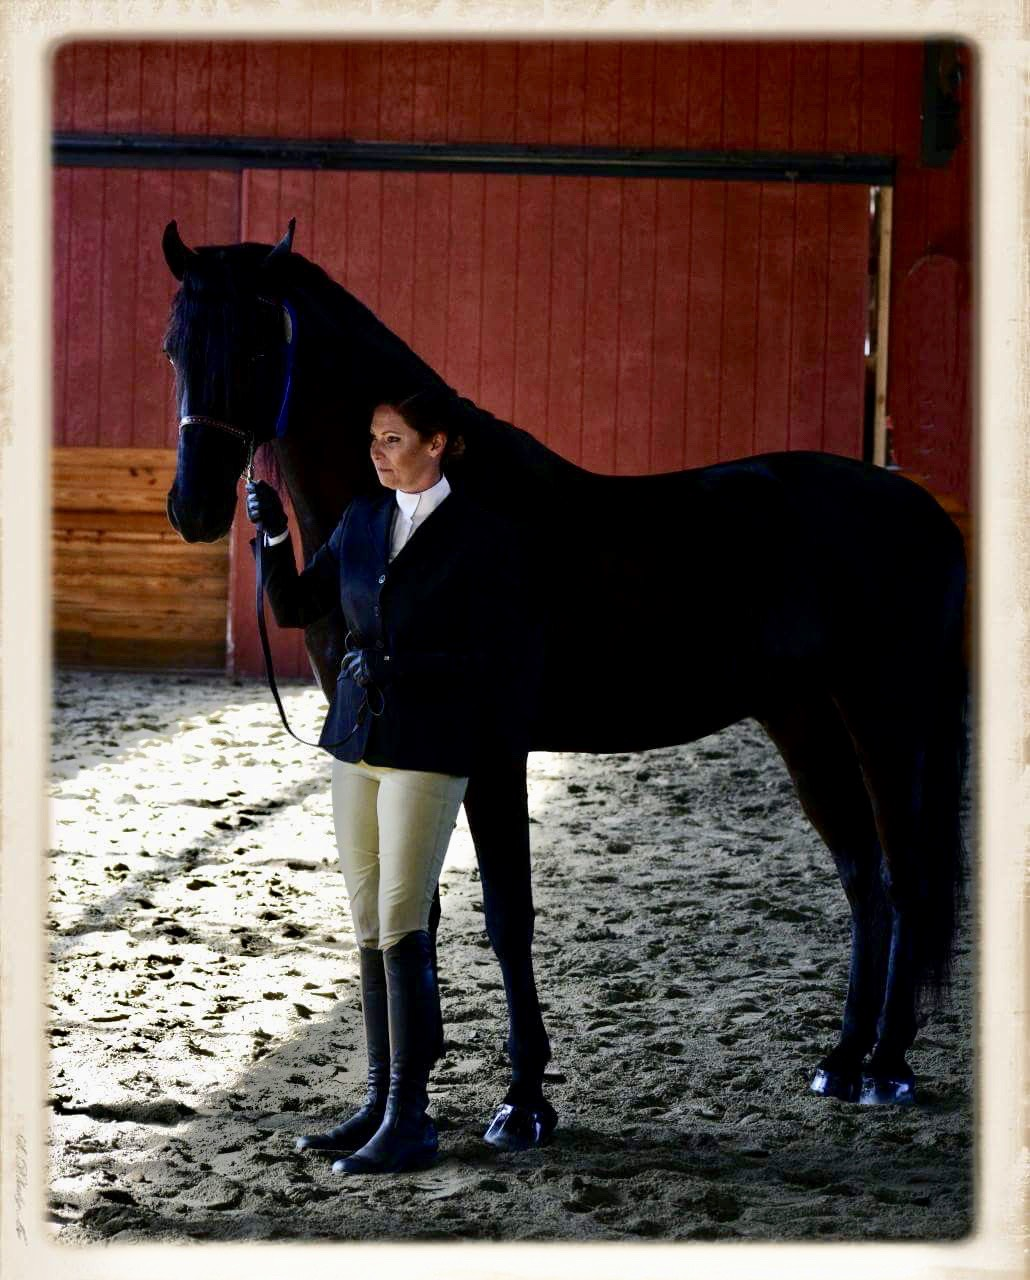 Corinthian Equestrian Center CEC LLC – It's all about the Horses